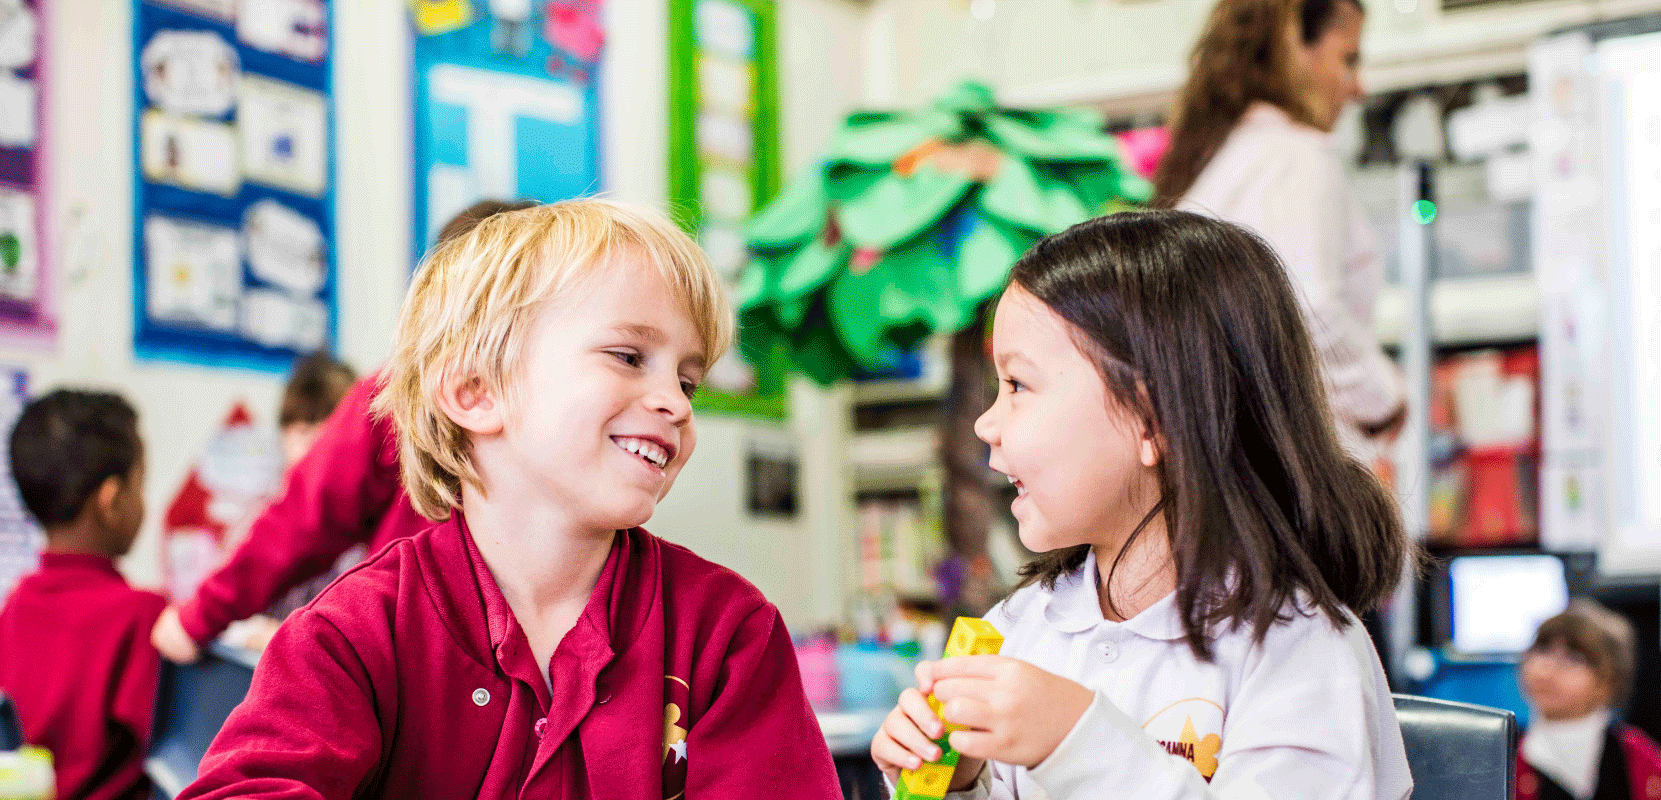 Australian Institute for Teaching and School Leadership